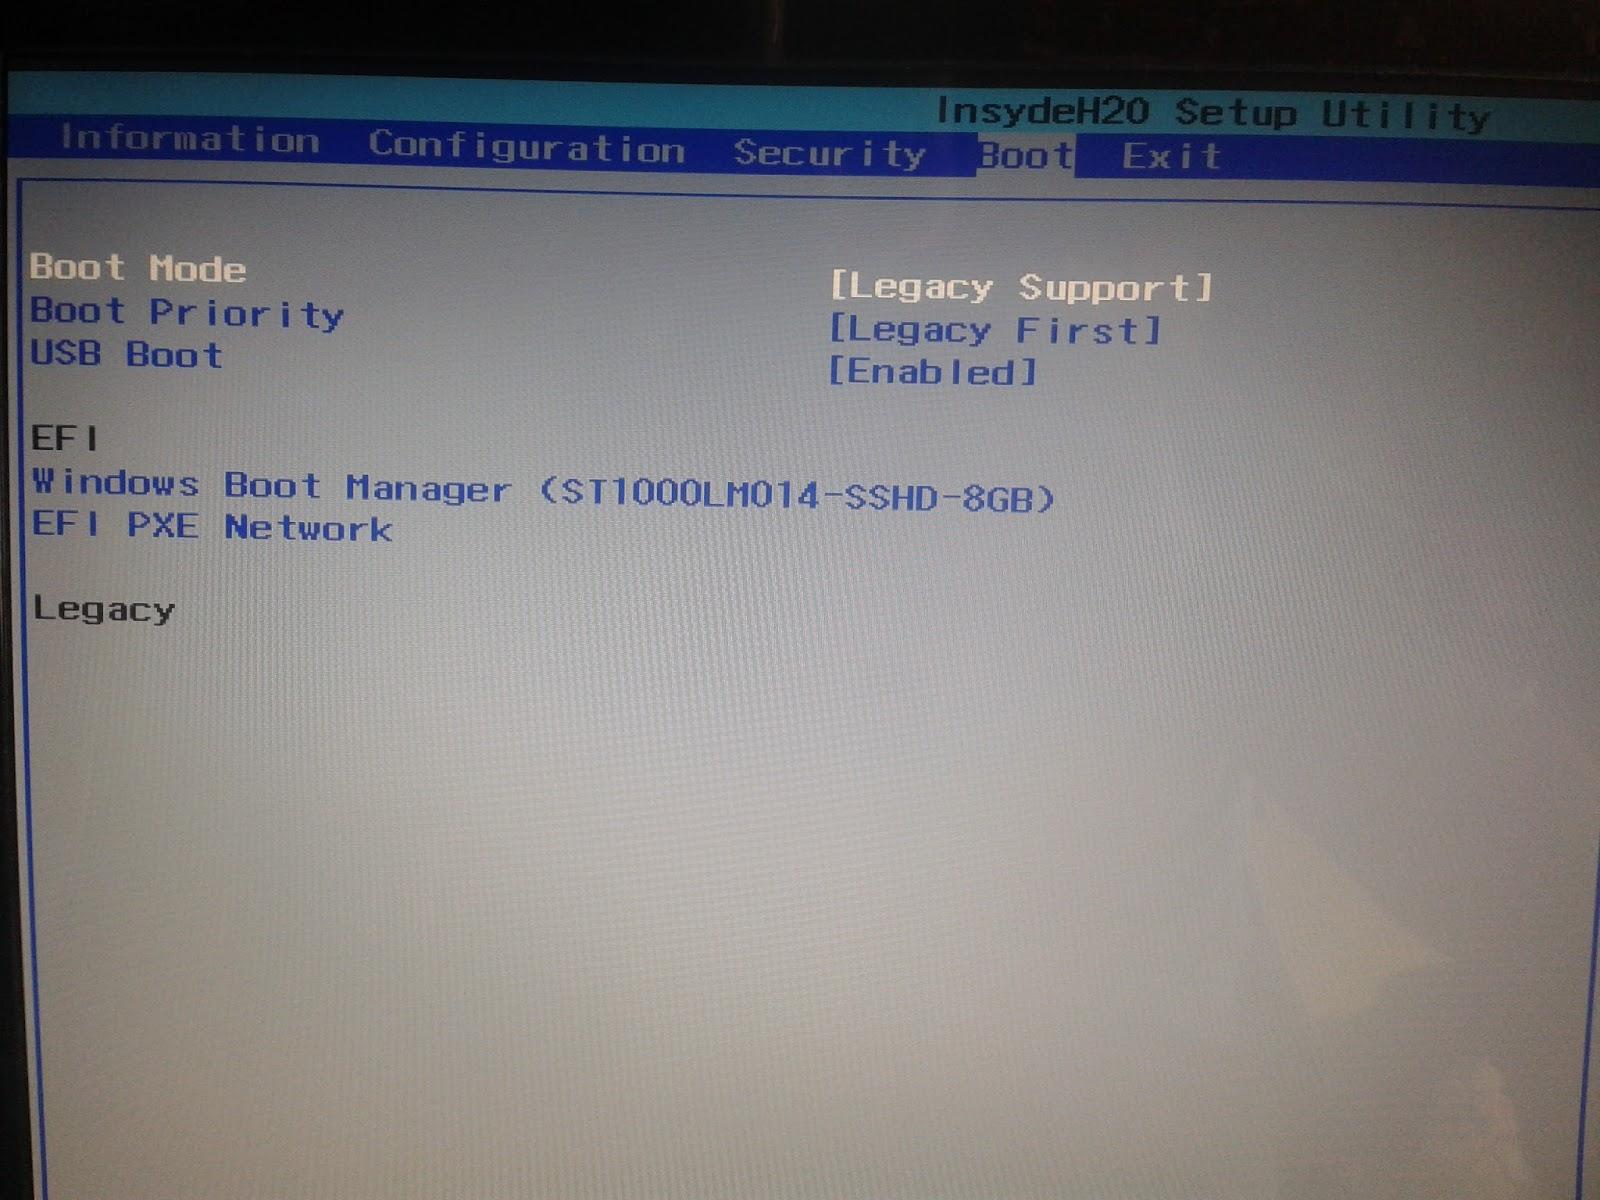 Enabling DVD boot for Lenovo G70-35 | Andys IT Blog